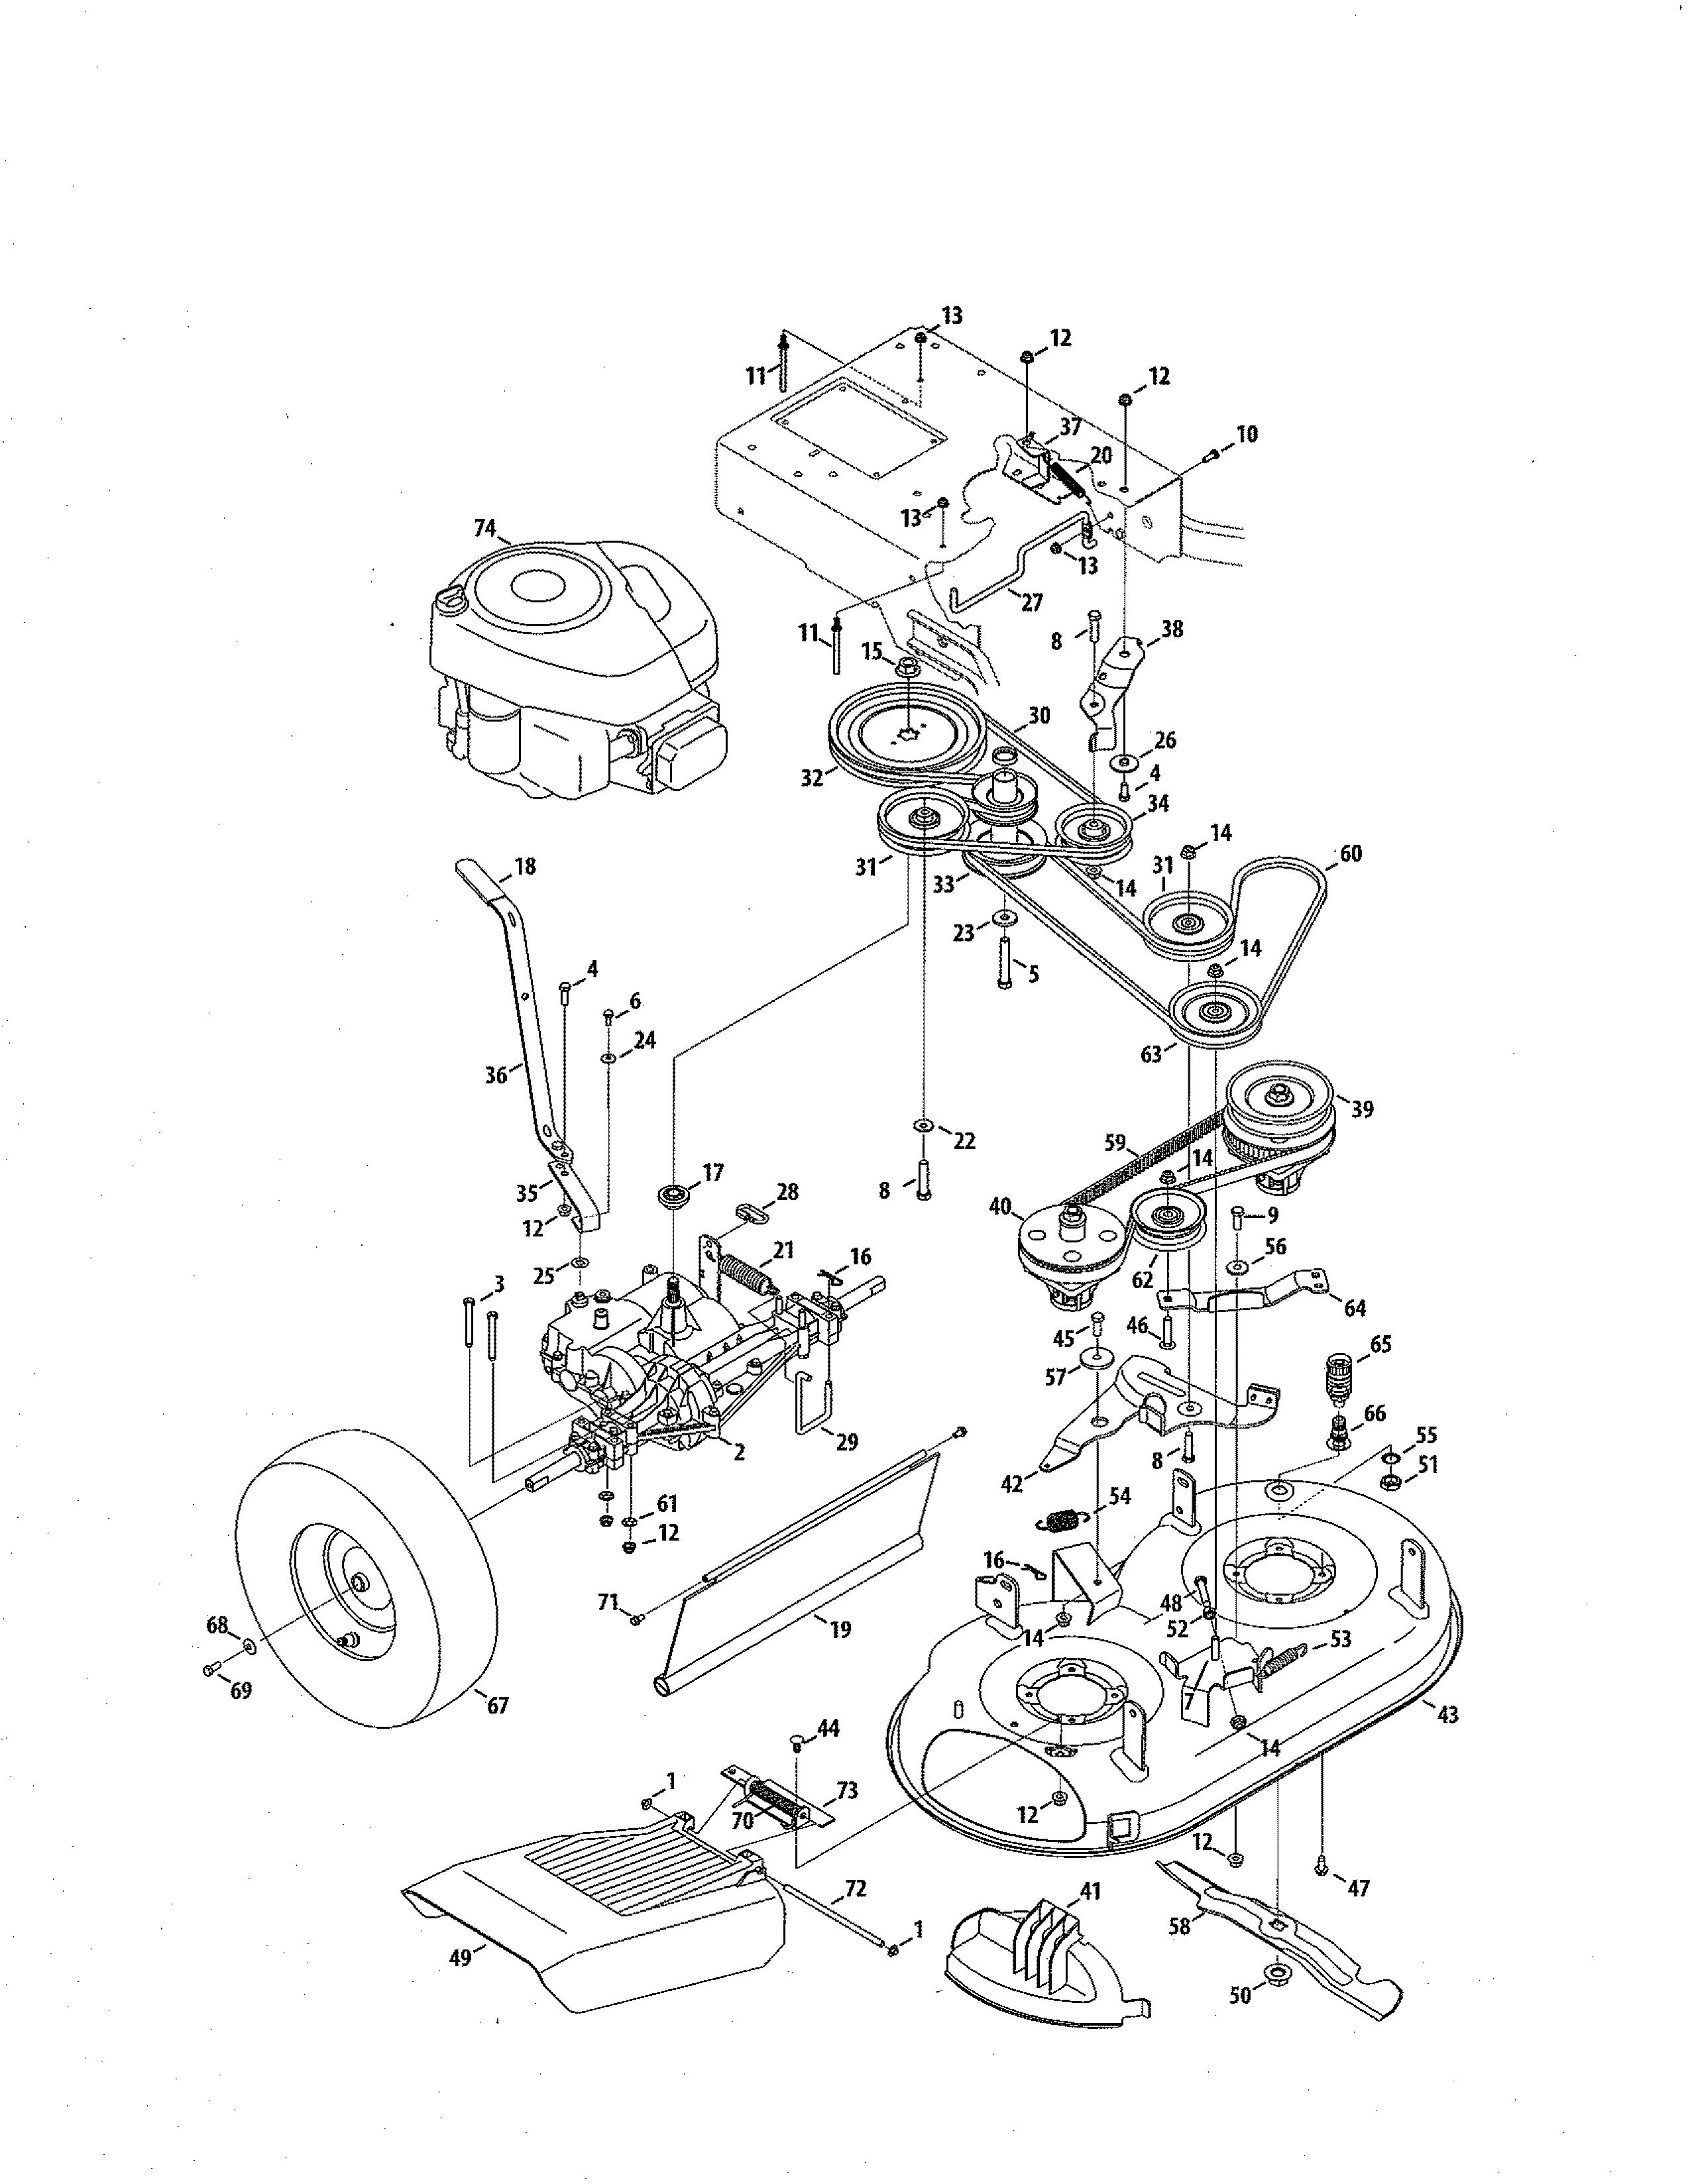 Pleasing Engine Pulley Diagram Wiring Library Wiring Cloud Picalendutblikvittorg